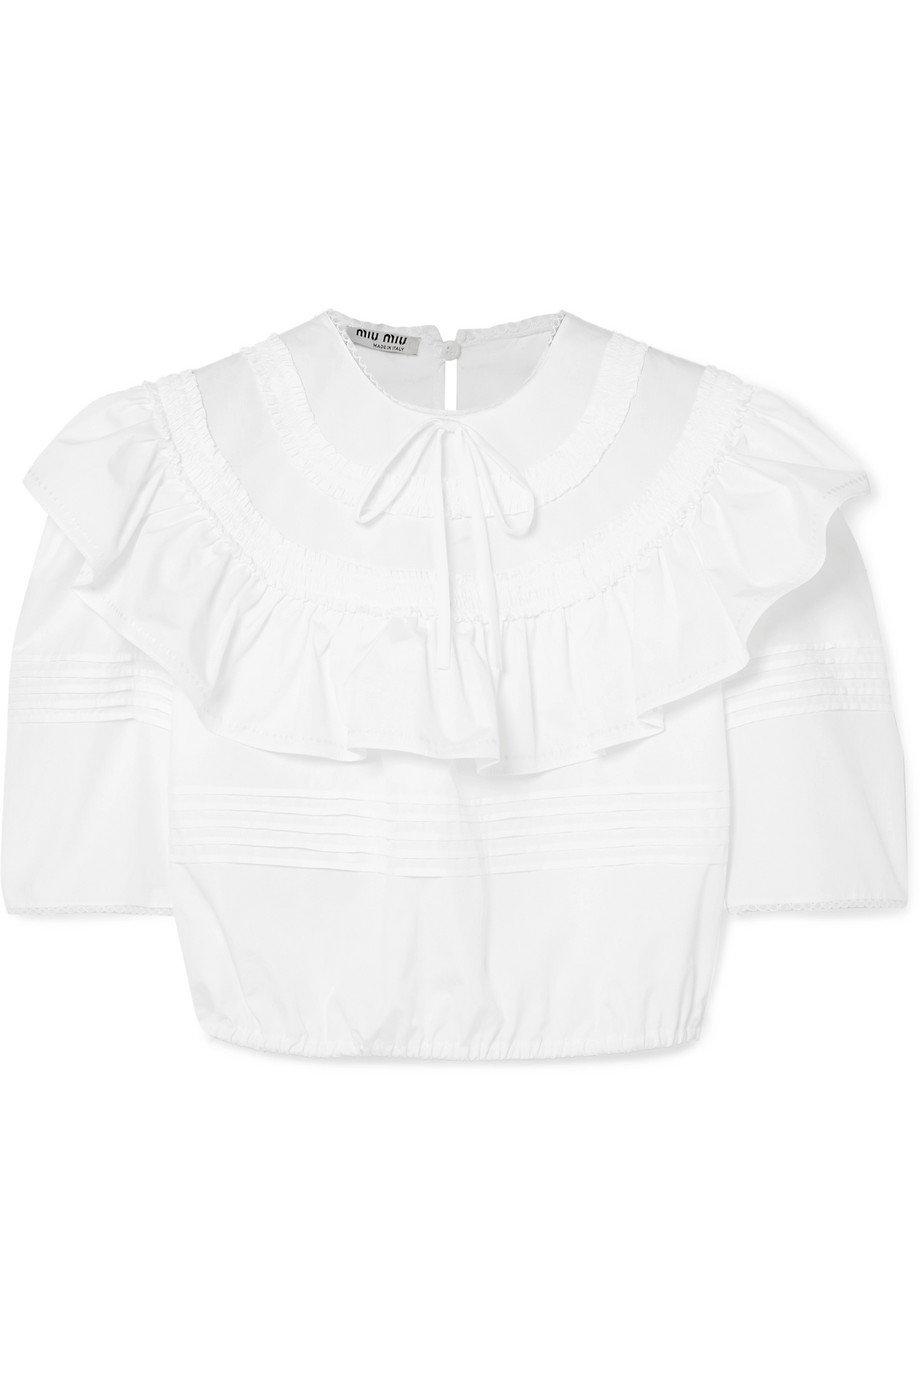 Miu Miu | Cropped ruffled cotton-poplin blouse | NET-A-PORTER.COM